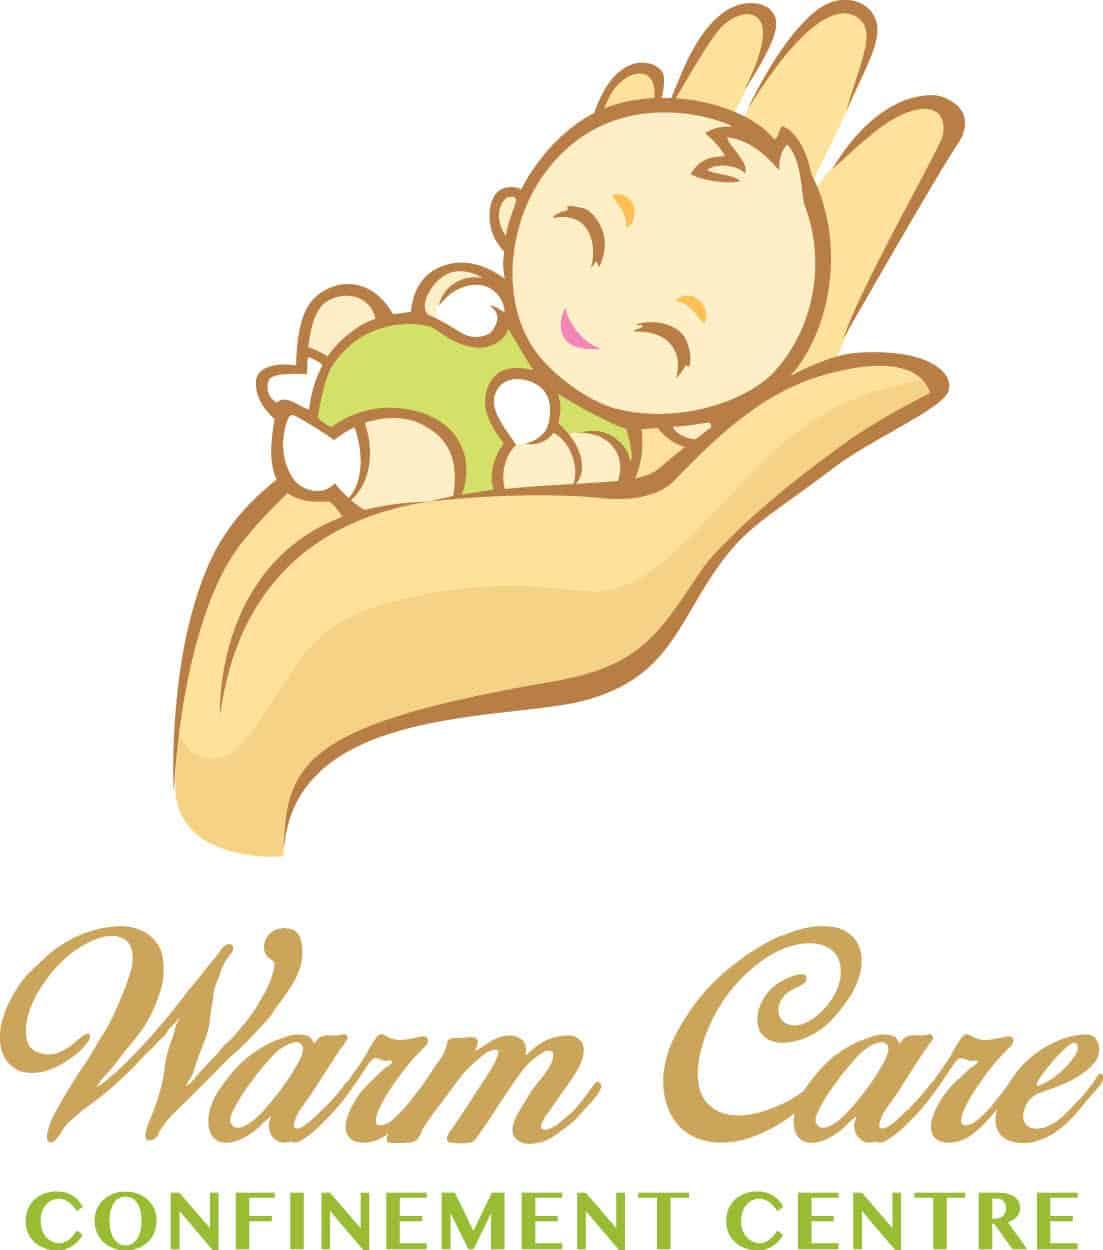 warm care